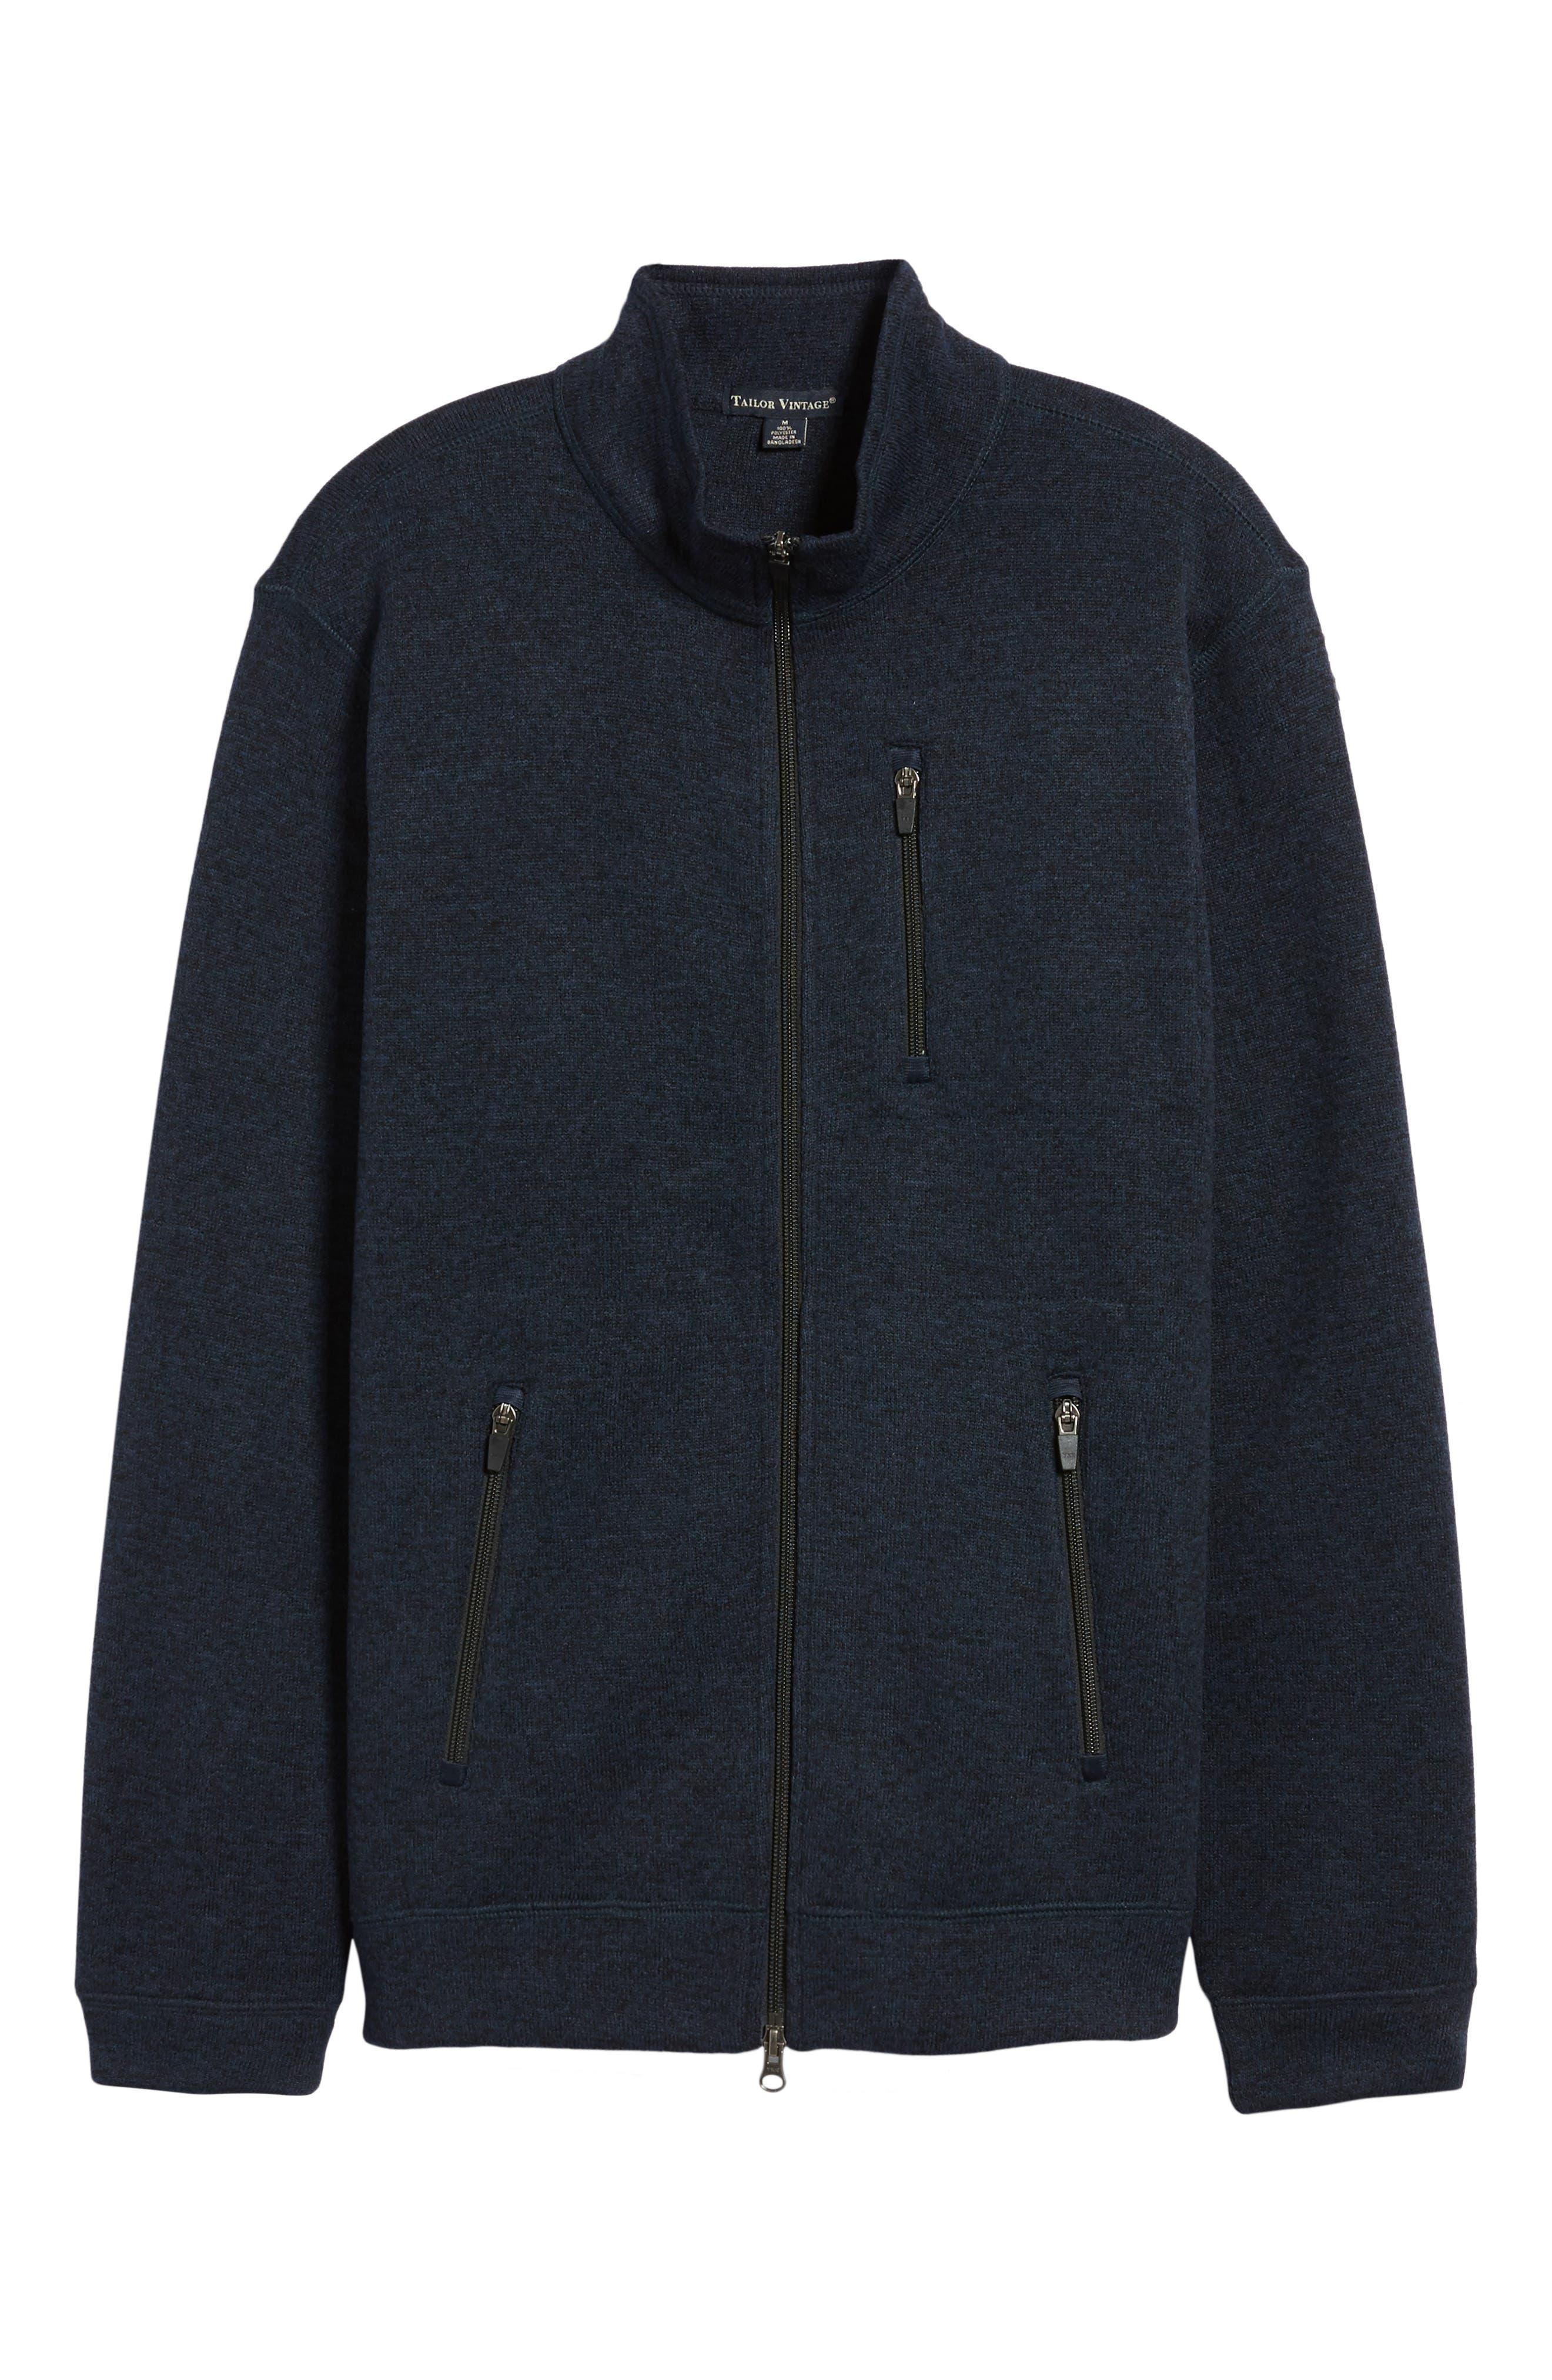 Sweater Knit Fleece Zip Front Jacket,                             Alternate thumbnail 18, color,